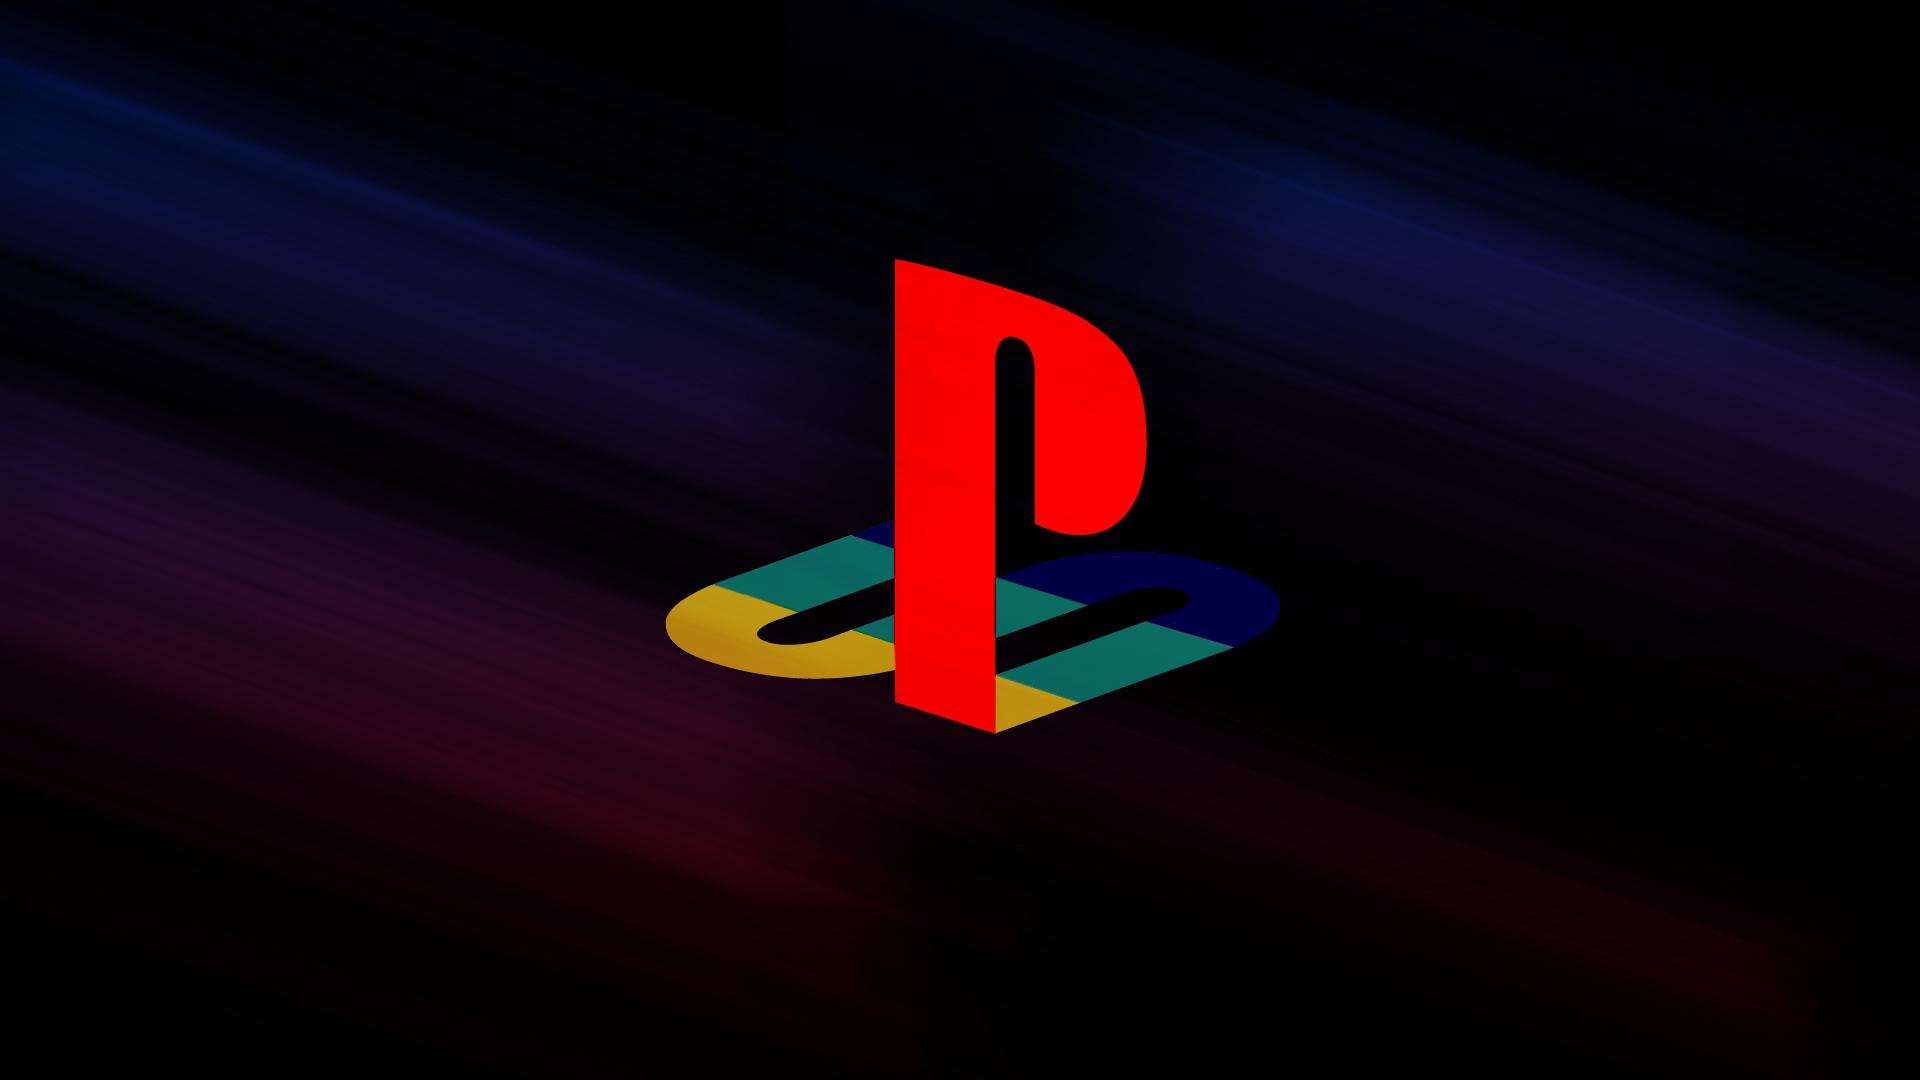 http://www.ozeros.com/wp-content/uploads/2013/02/playstation_logo1.jpg